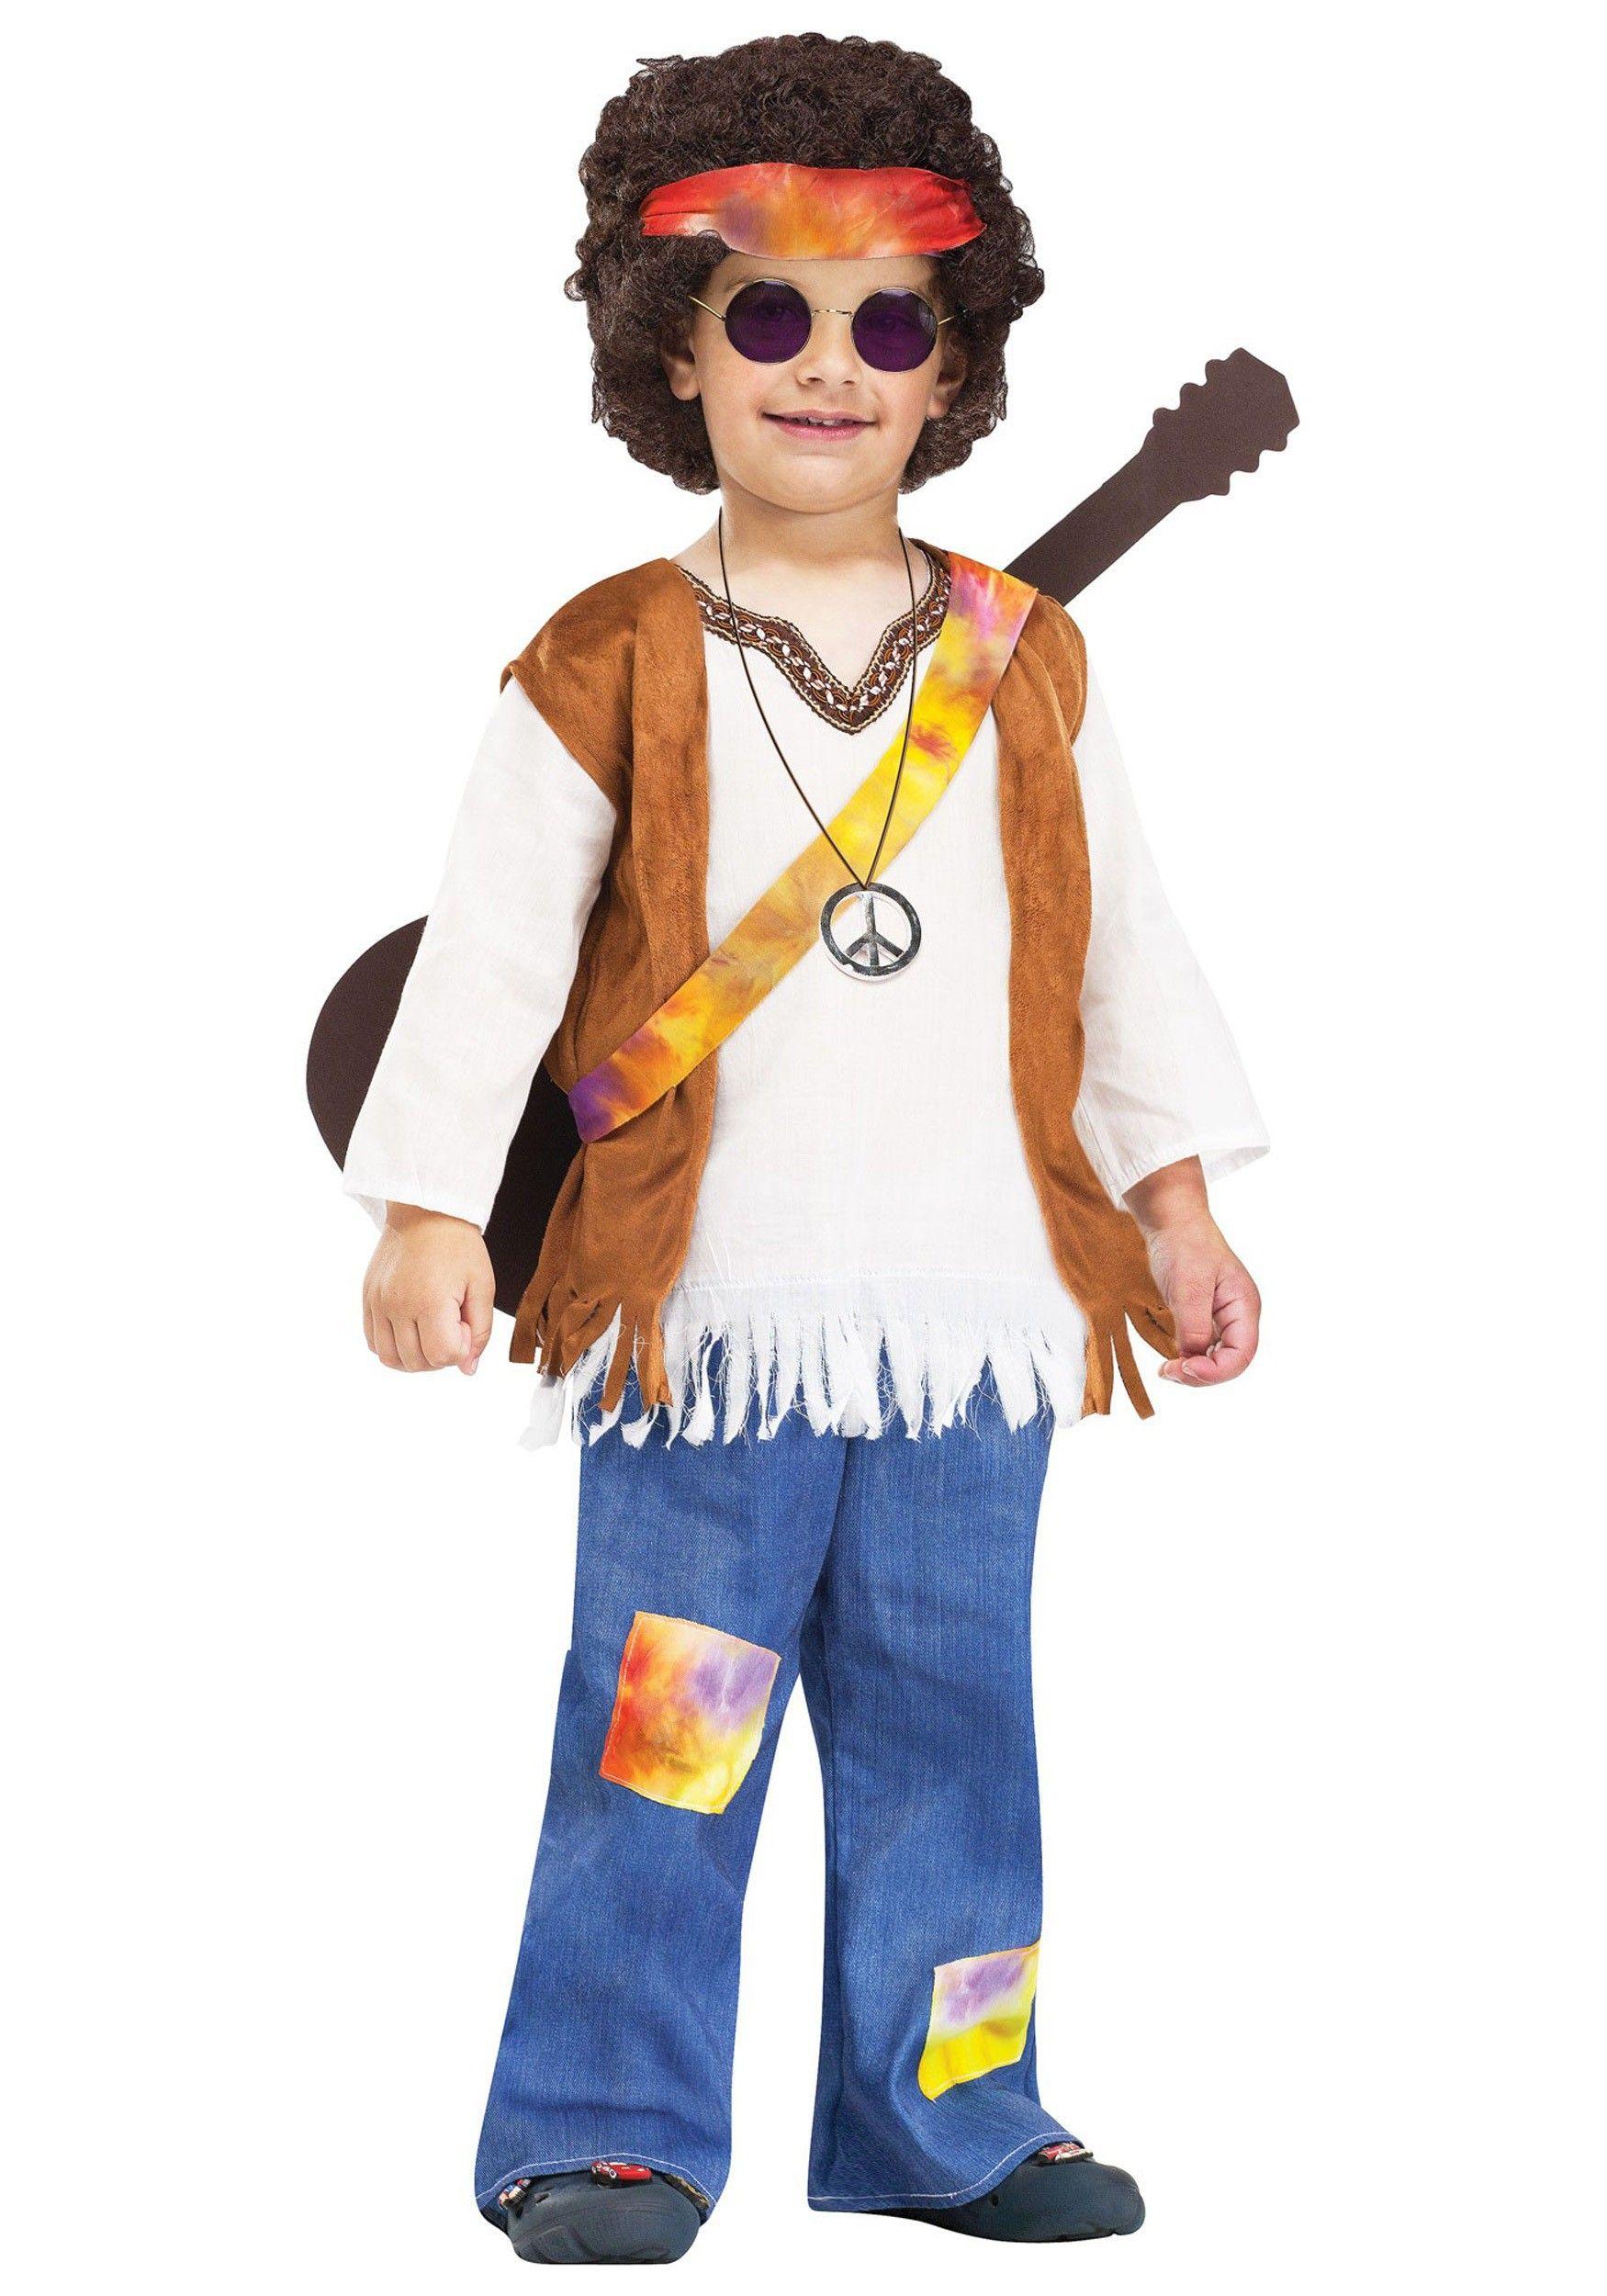 Fantasia Infantil Meninos Hippie Anos 70 Carnaval Halloween